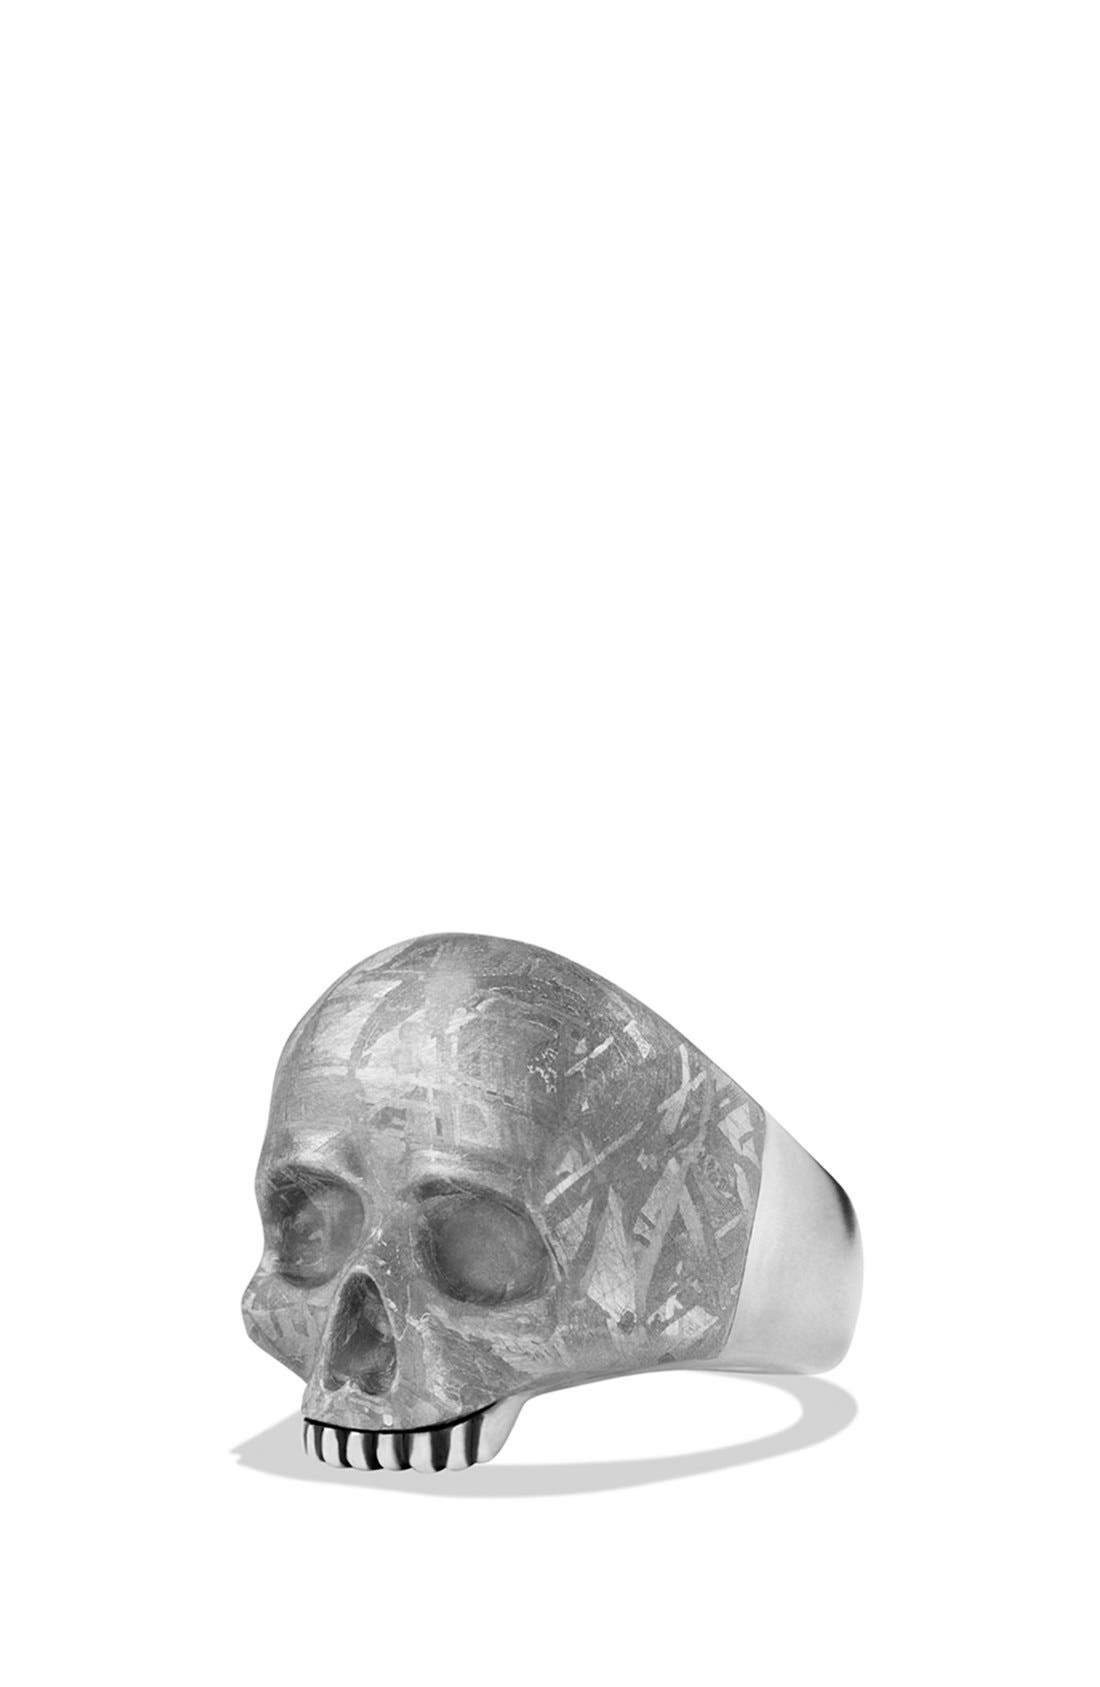 David Yurman 'Skull' Ring with Carved Meteorite